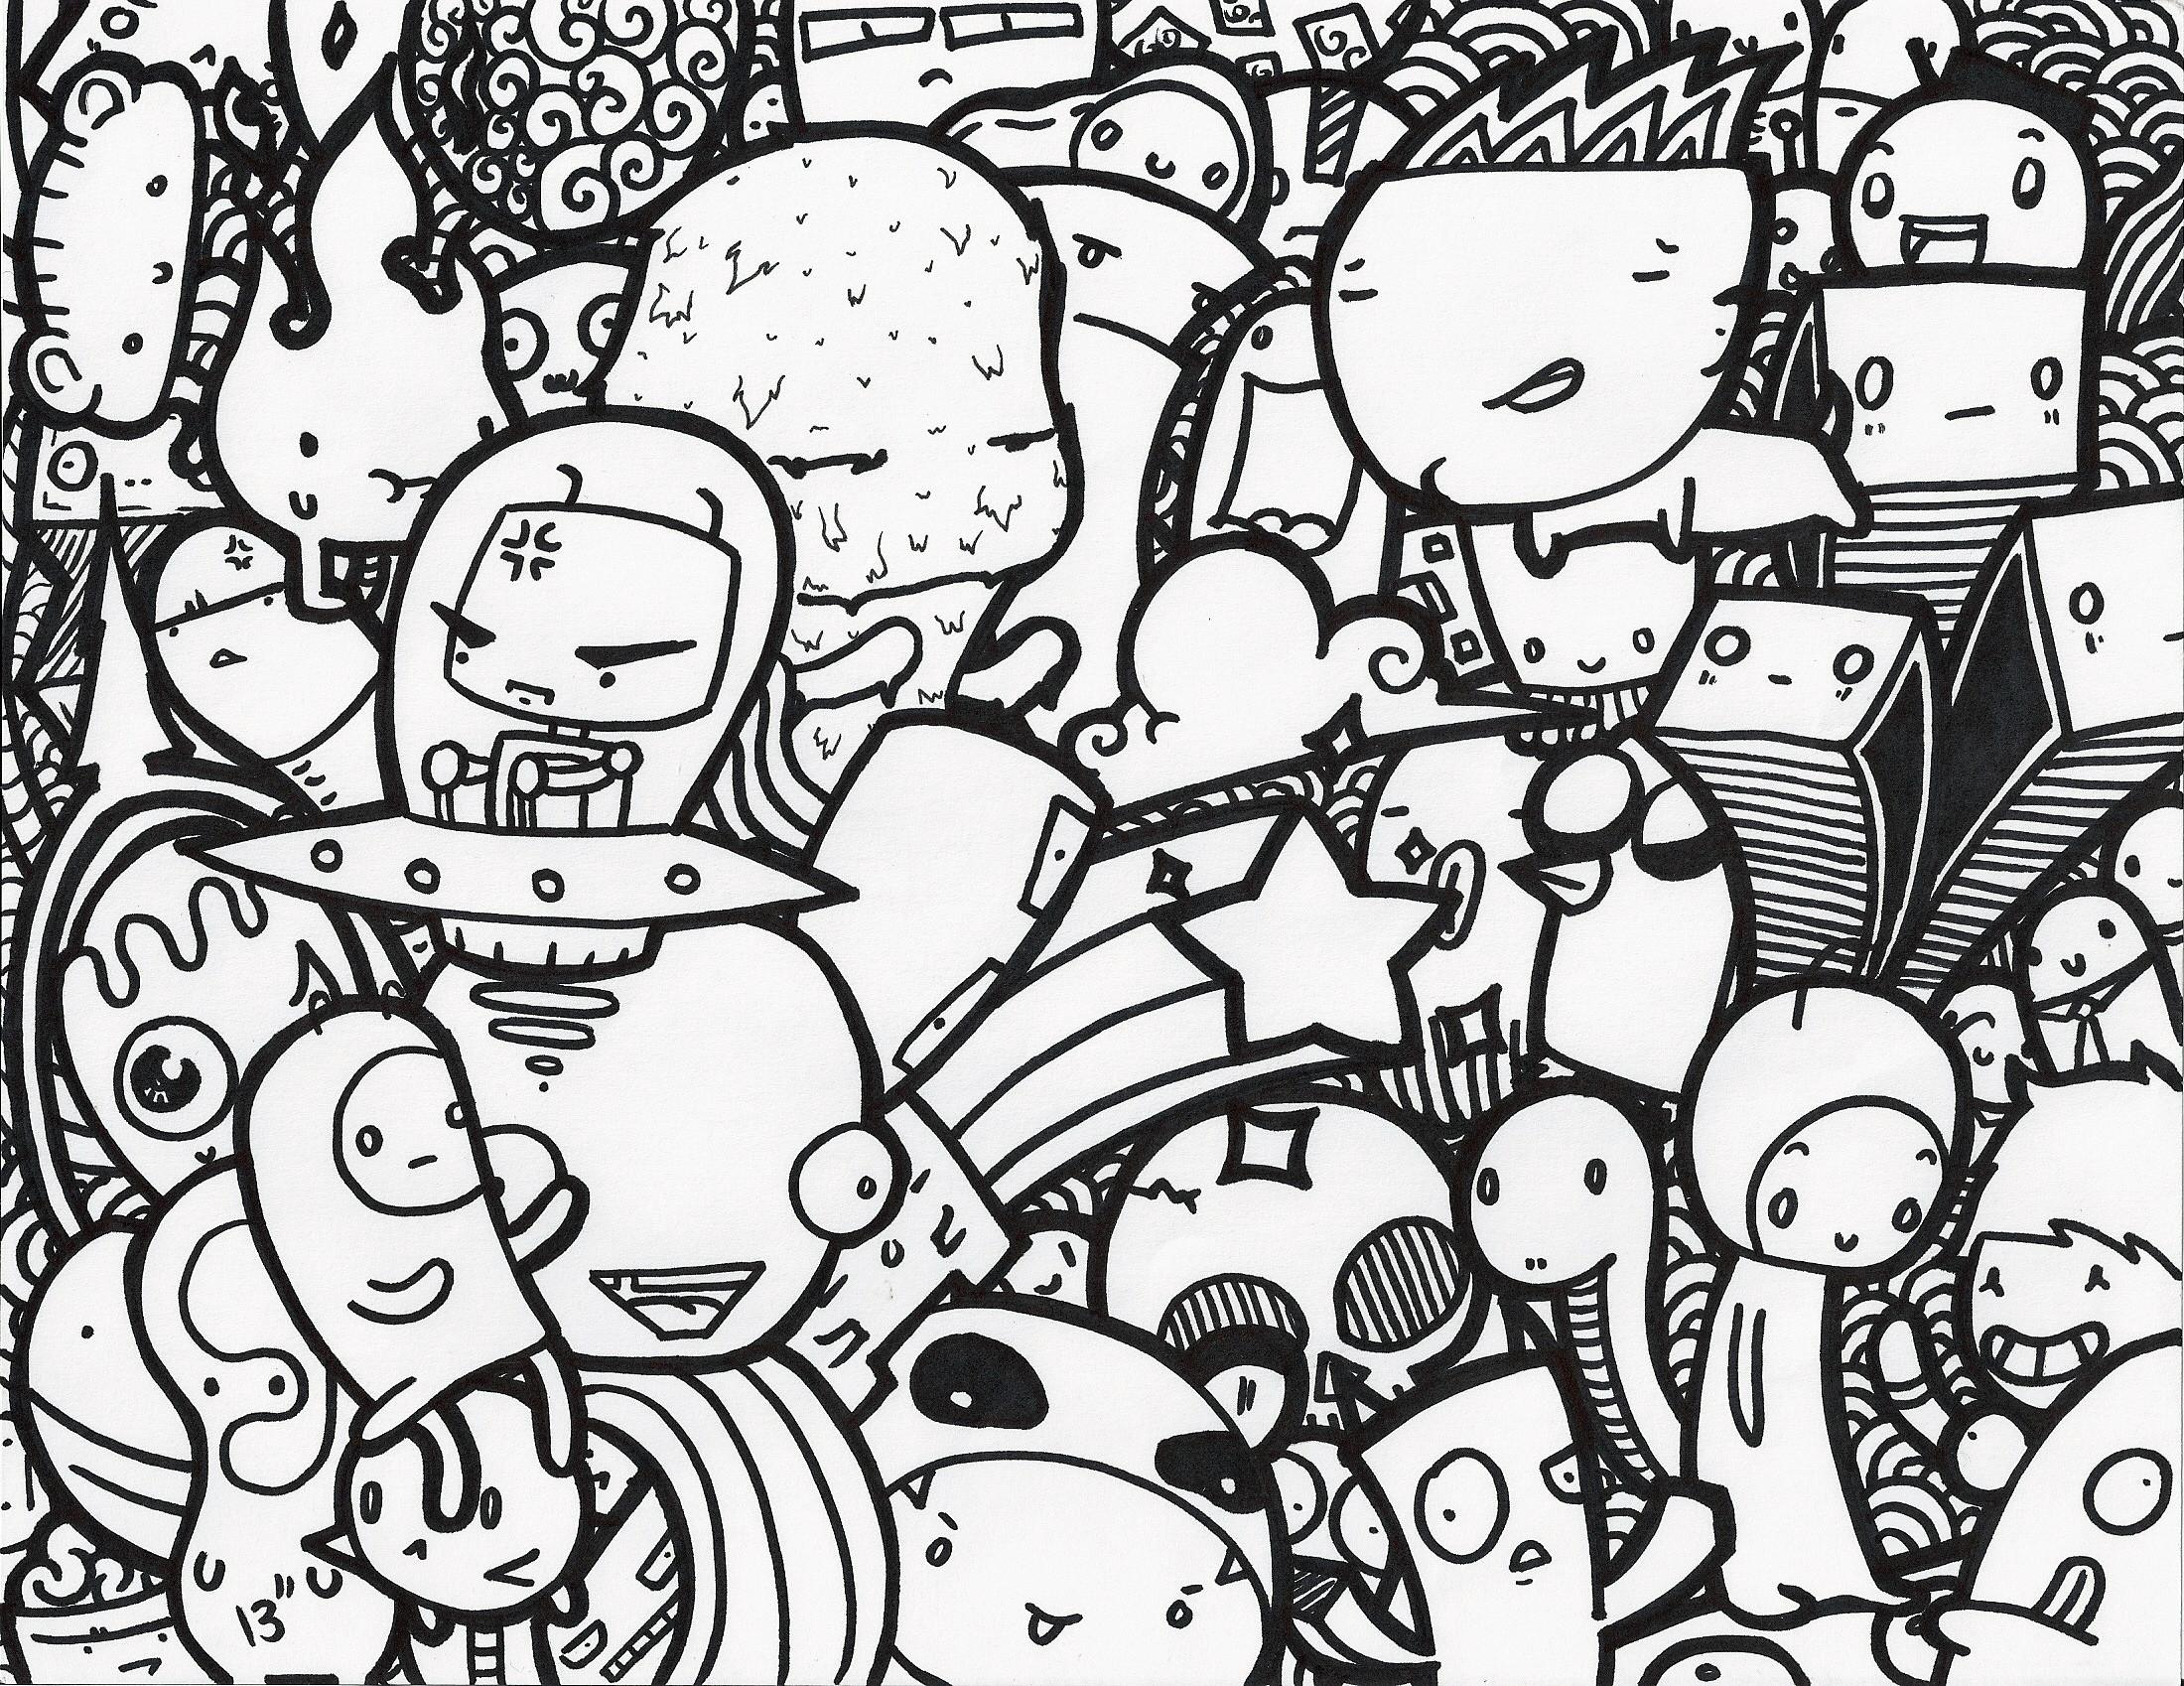 2200x1698 Doodle Art Hd Doodle Wallpapers – Wallpapersafari